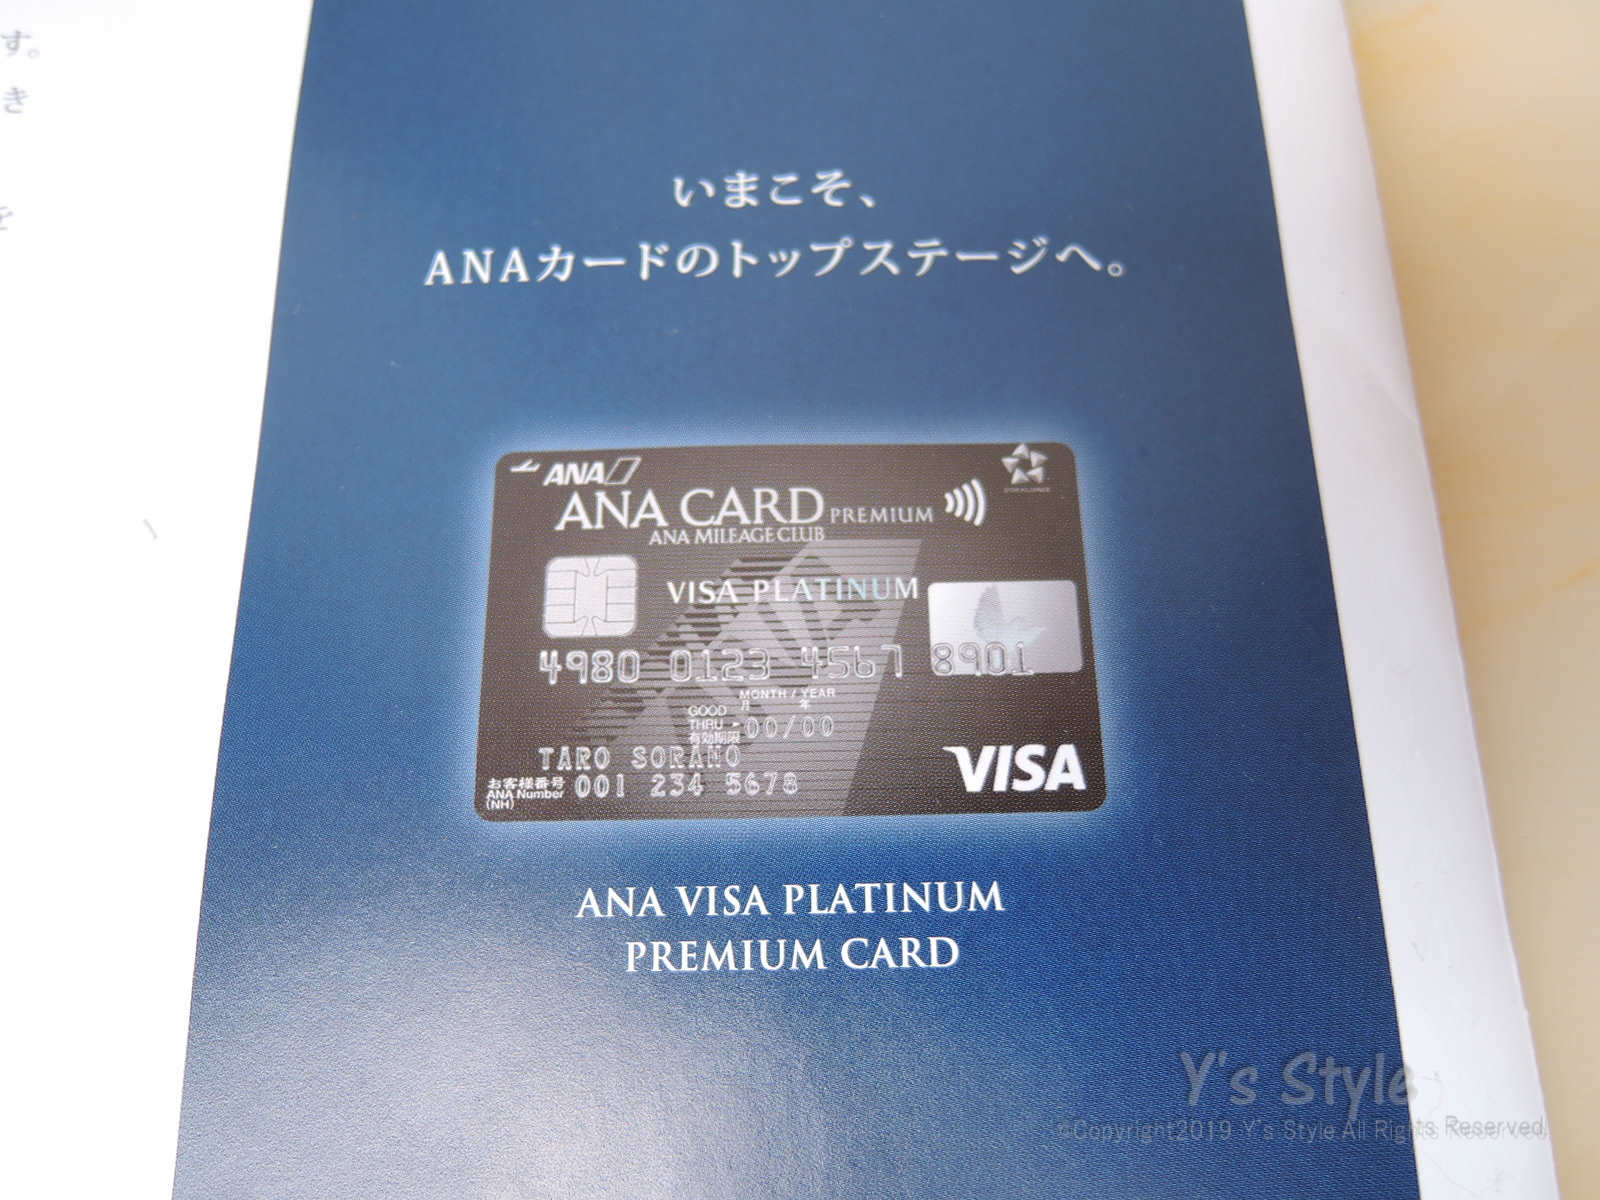 ANA VISA ぷ、ぷ、プラチナプレミアムカードを検討してみる